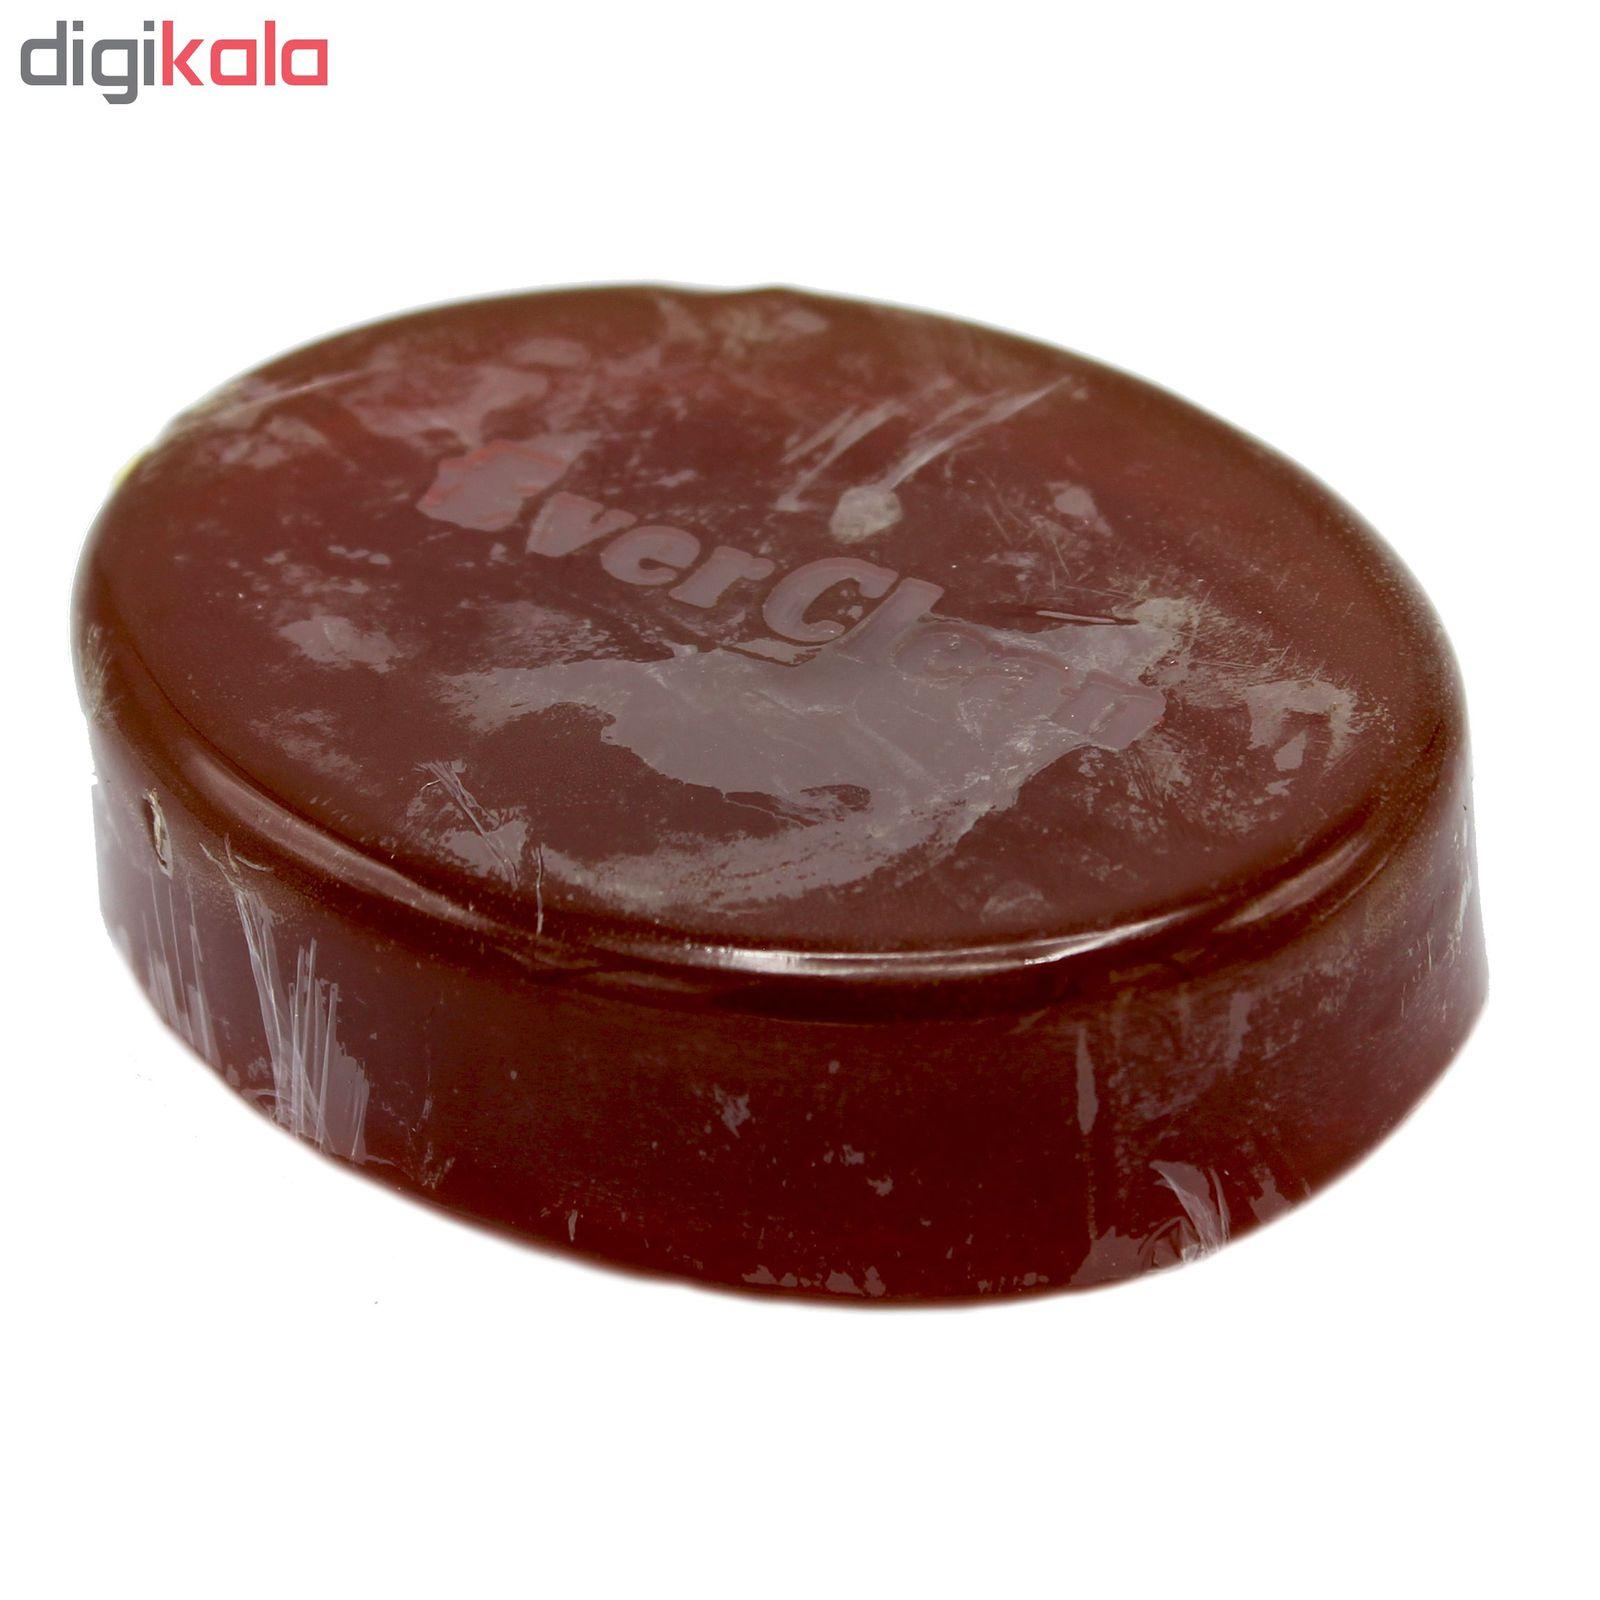 صابون اورکلین شفاف مدل زردچوبه  65 گرم main 1 2